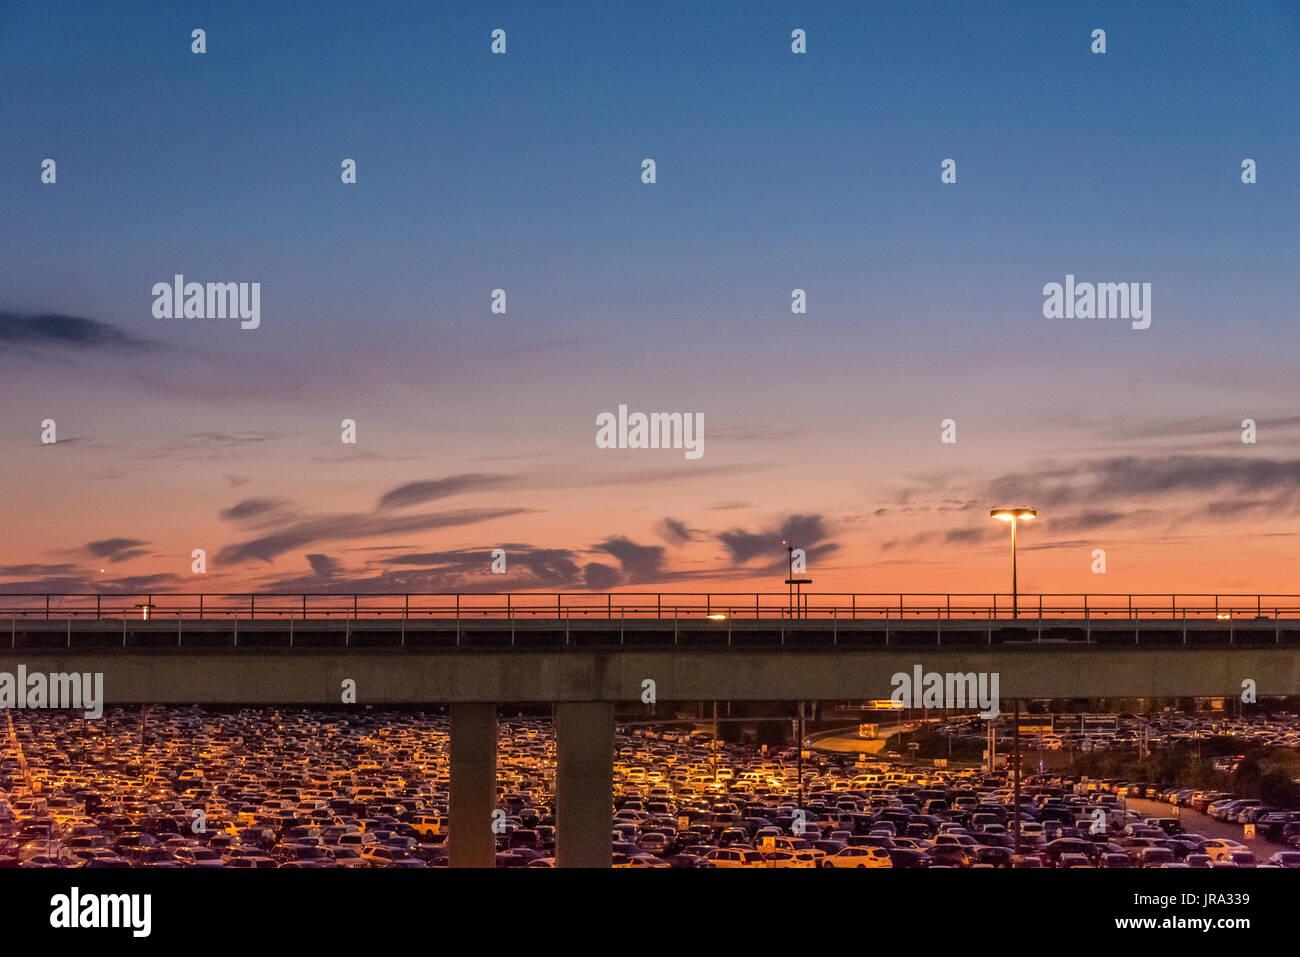 Dusk settles over a full parking lot at Hartsfield-Jackson Atlanta International Airport in Atlanta, Georgia. (USA) - Stock Image